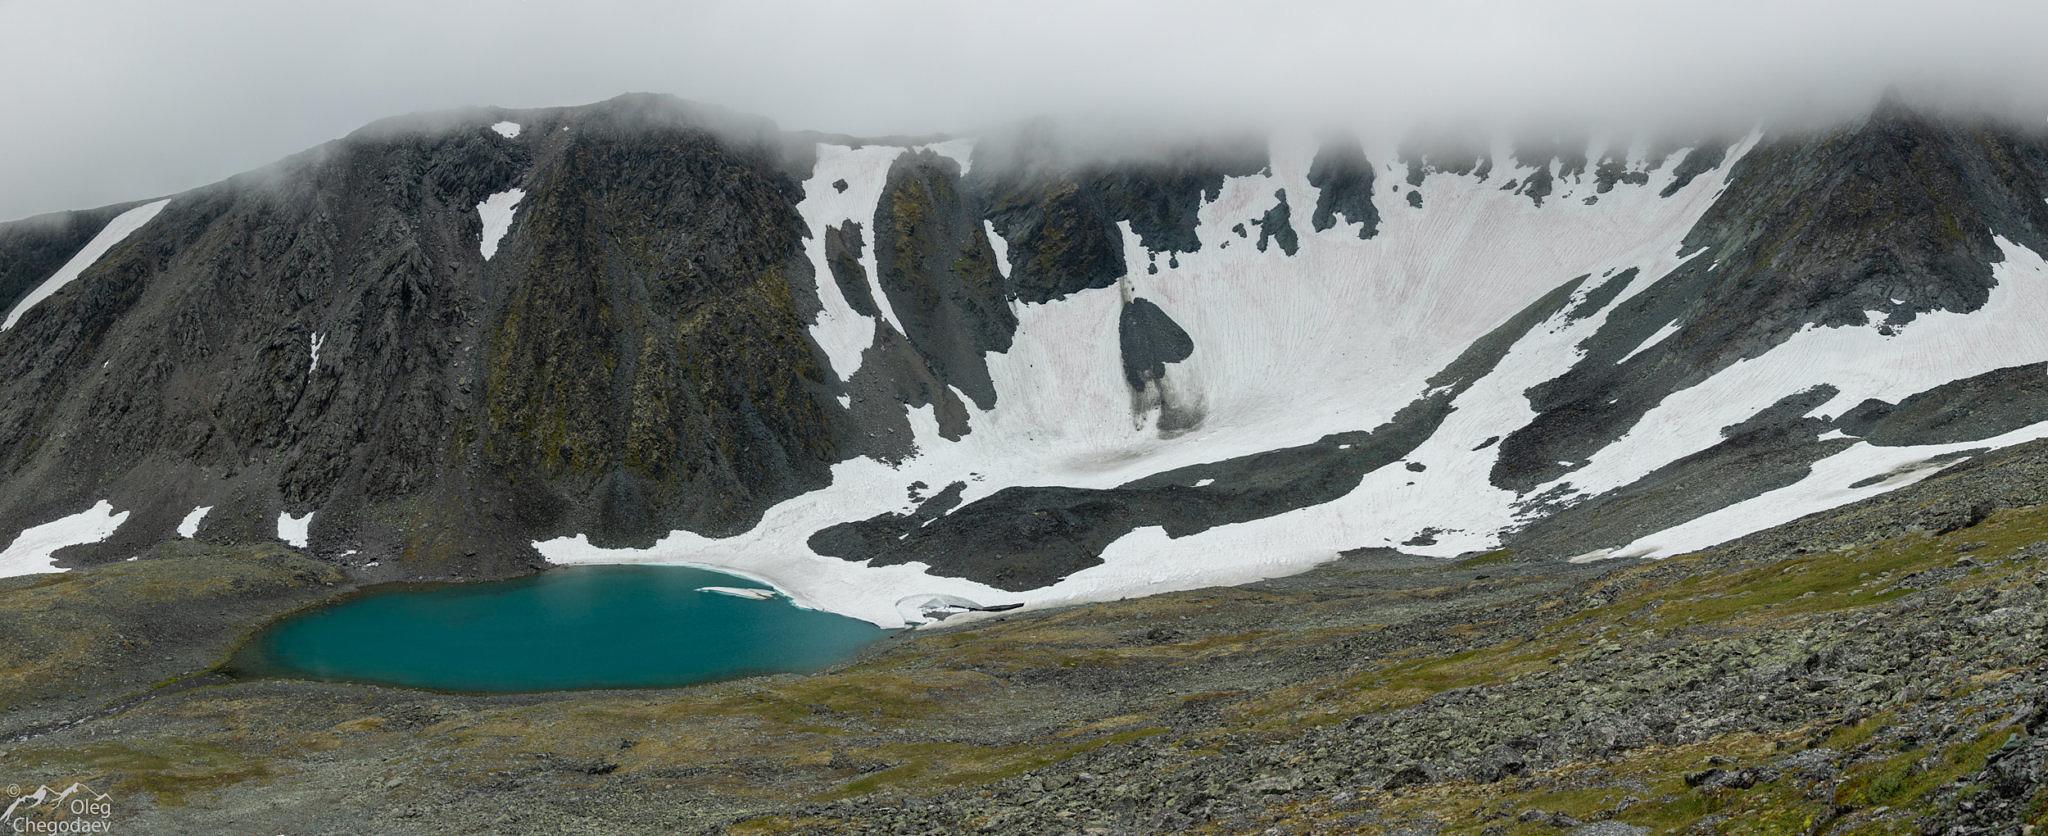 Ледник Кулика со склонов горы Нарнаурдыкеу